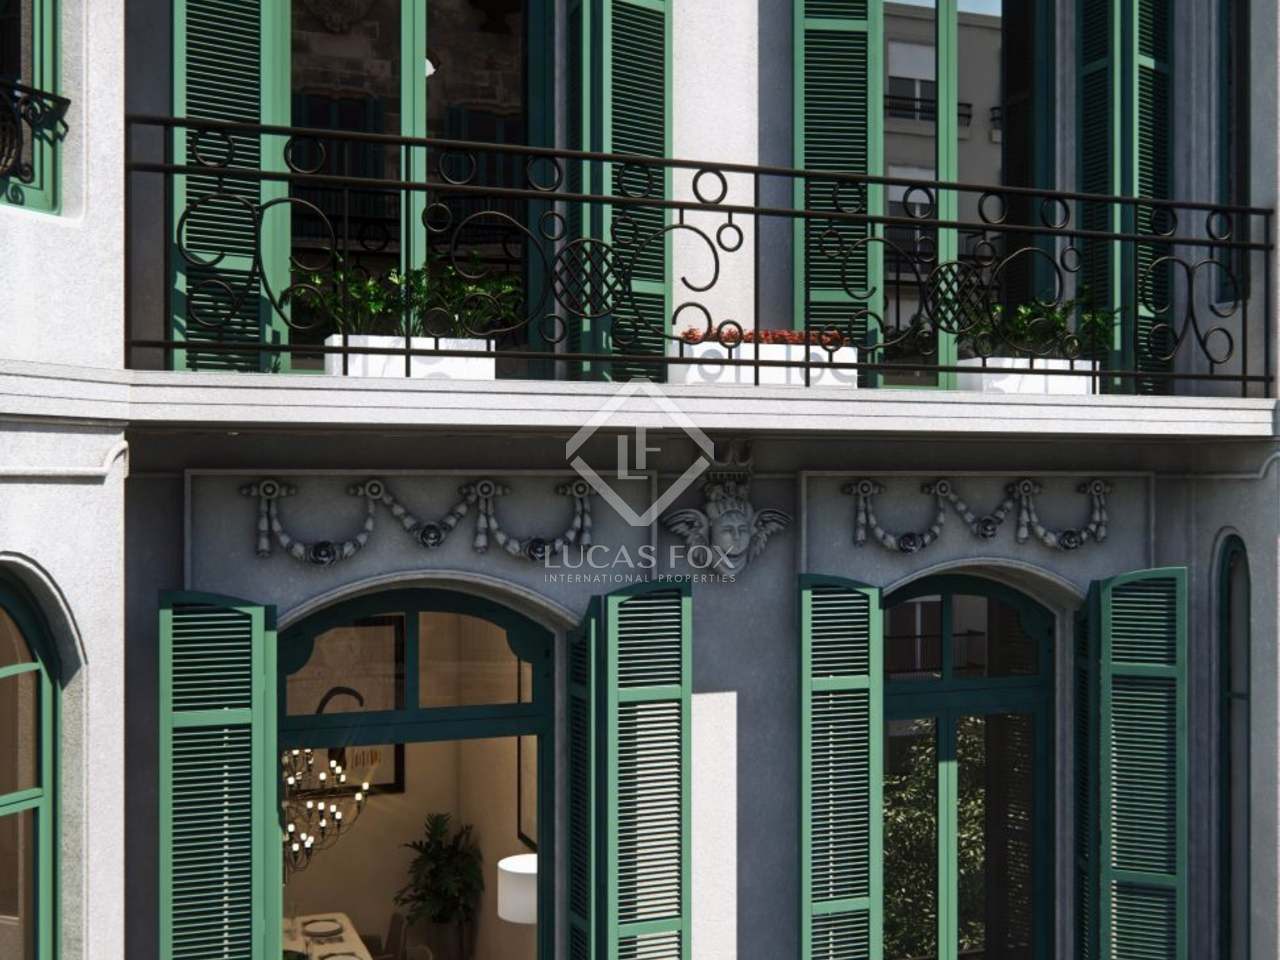 Penthouse for sale on calle casp barcelona 39 s eixample area - Calle casp barcelona ...